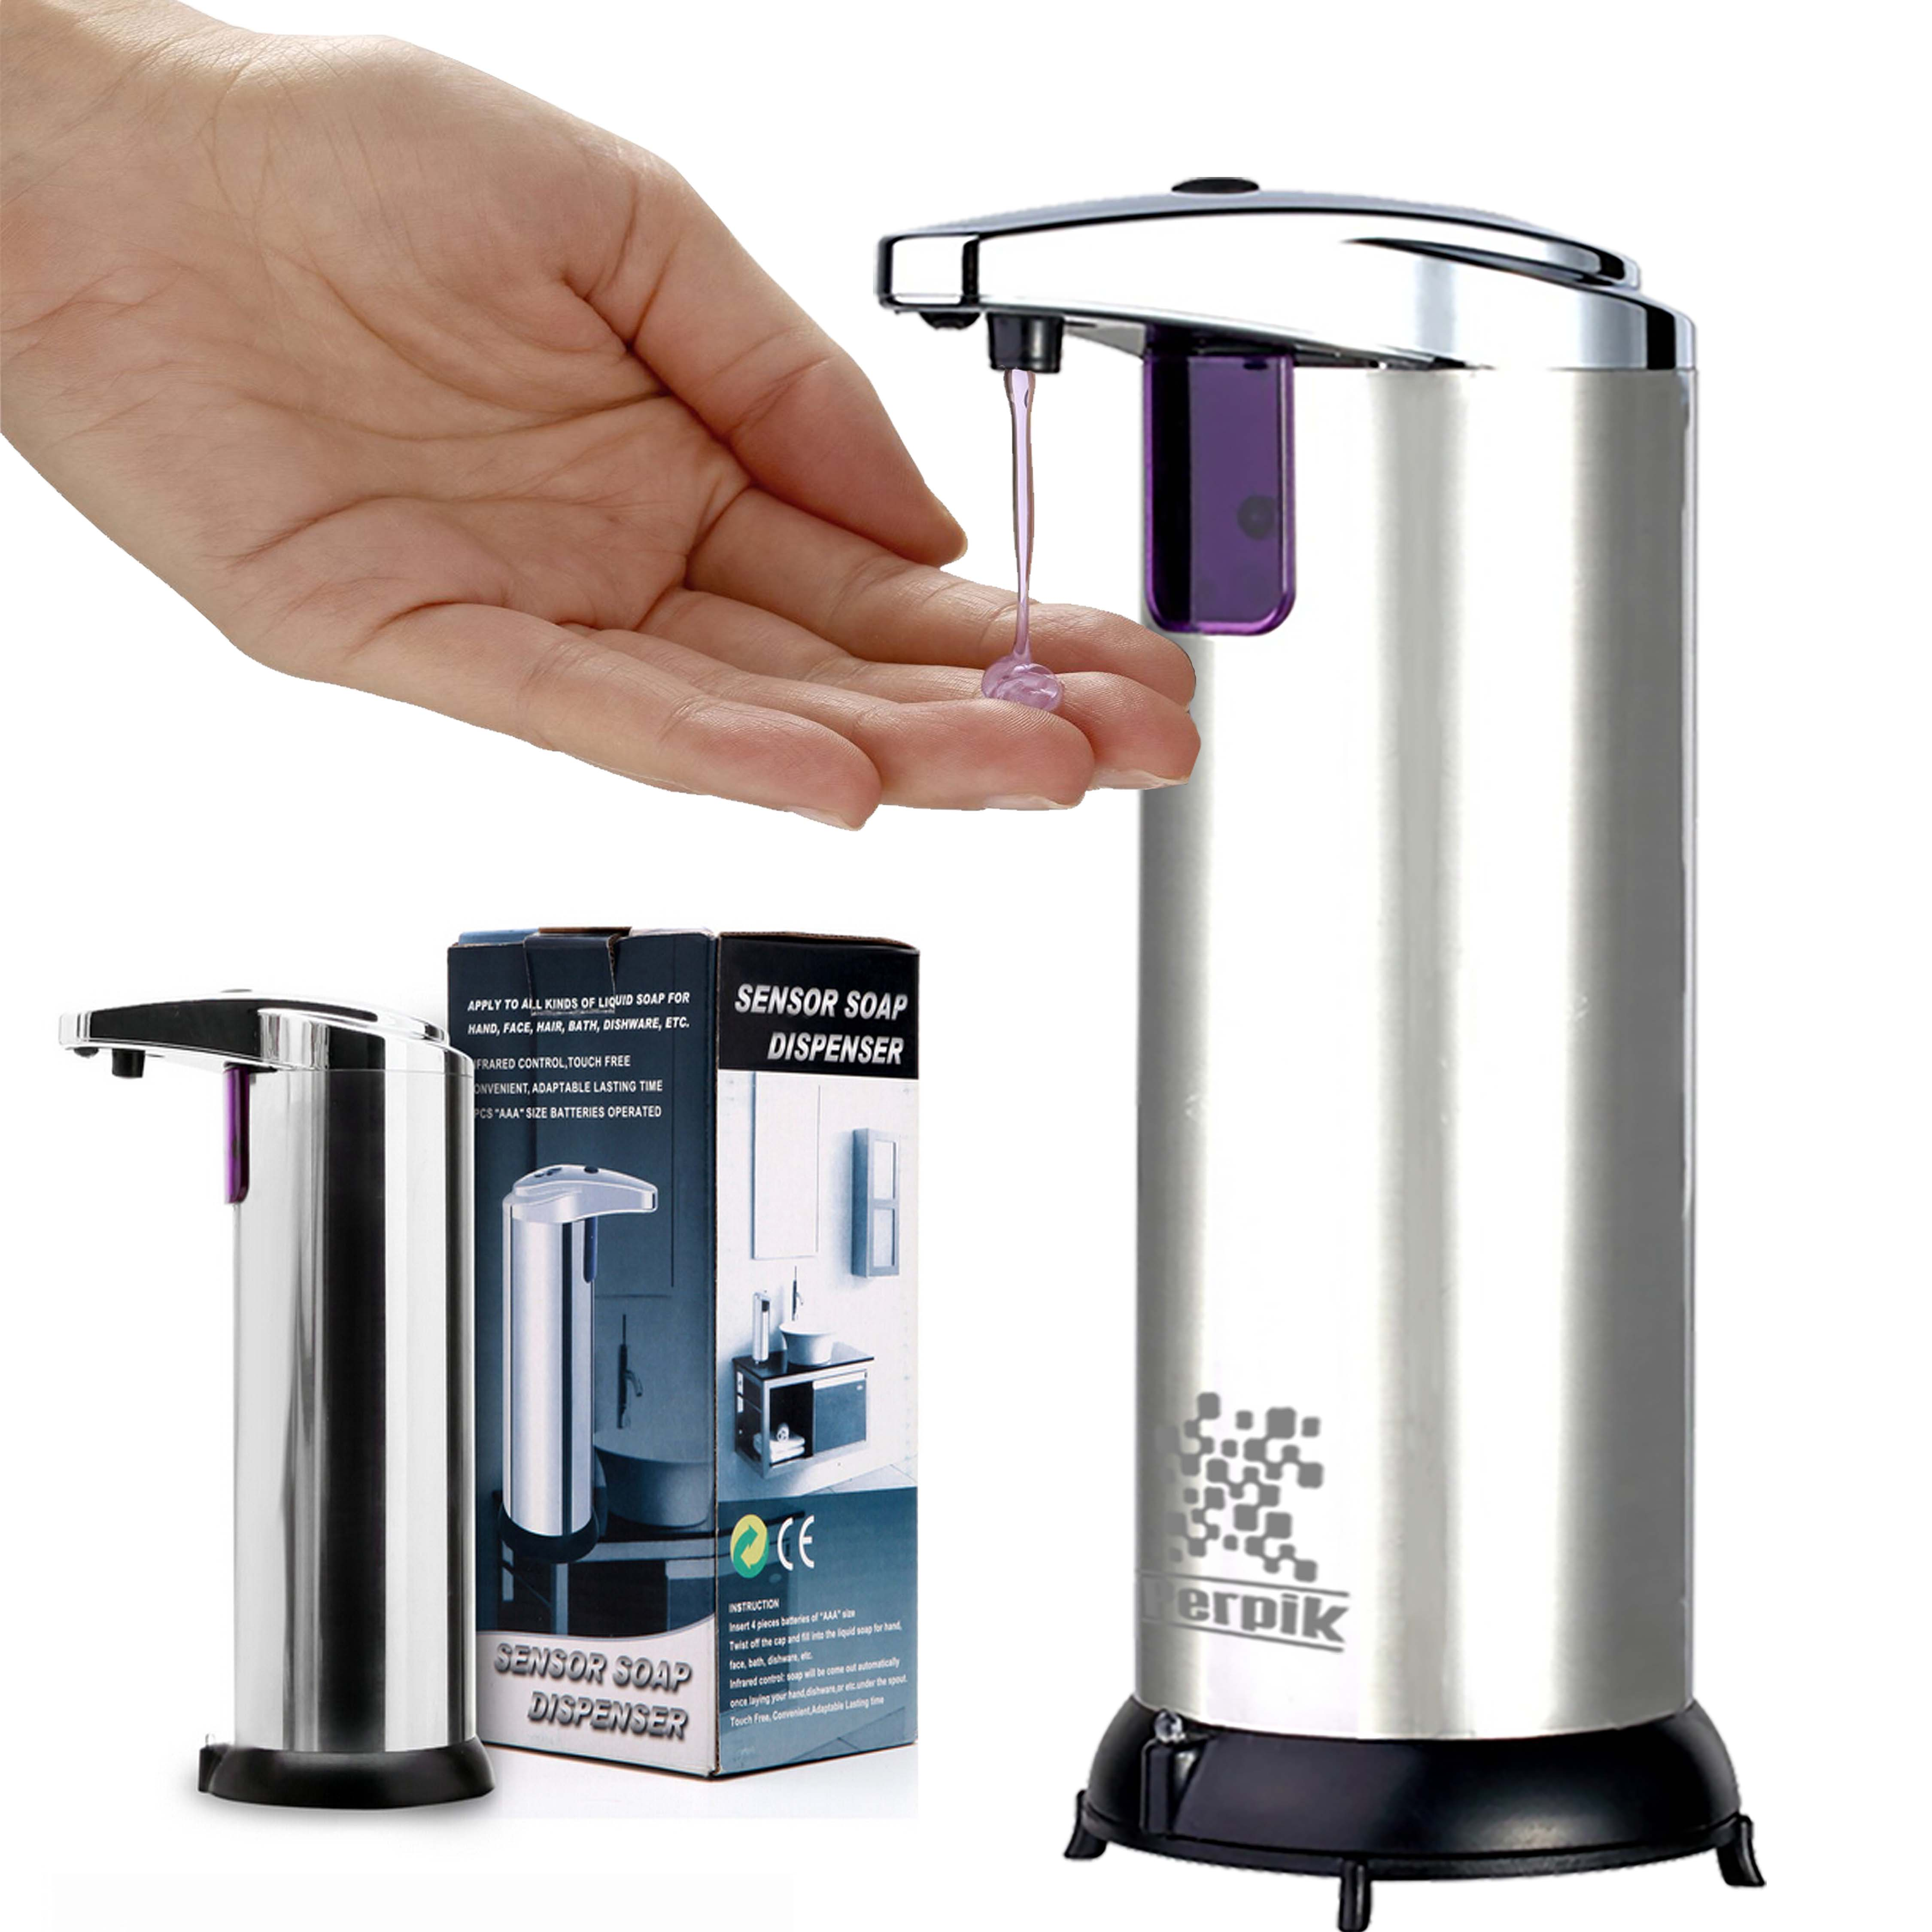 PerPik Announces Launch of Premium Quality Touch-Free Automatic Soap ...